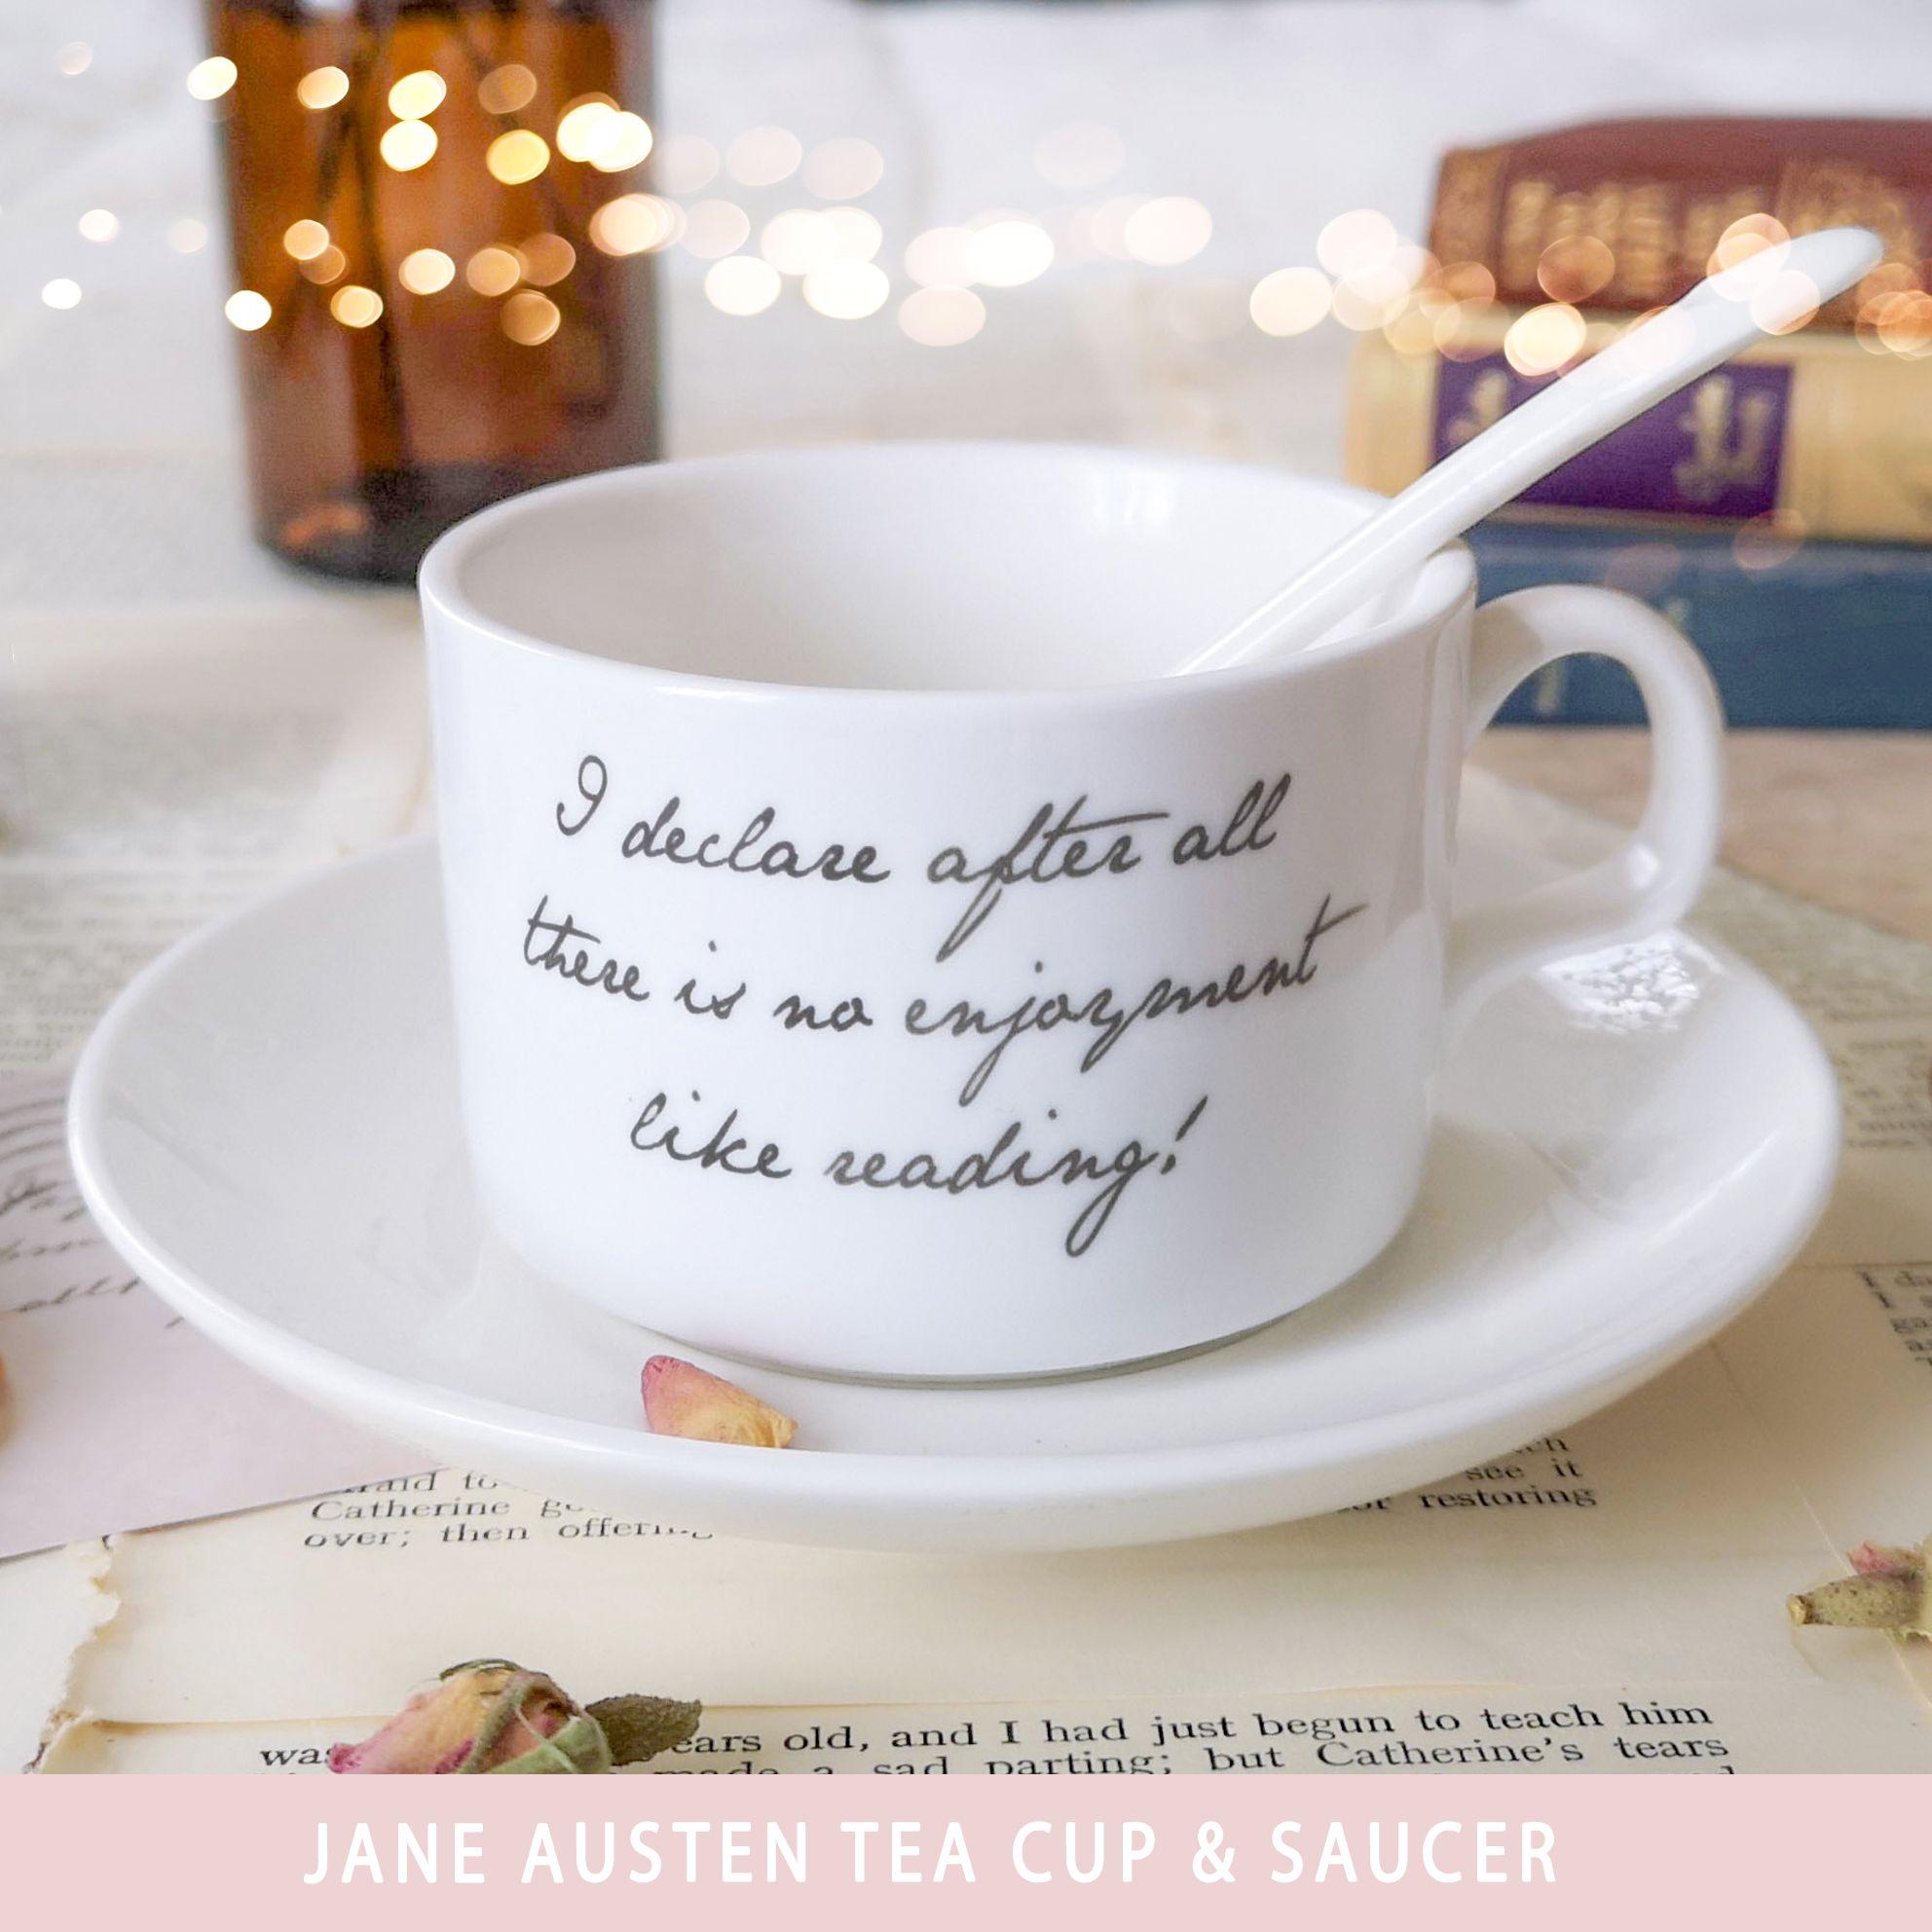 Jane Austen tea cup and saucer